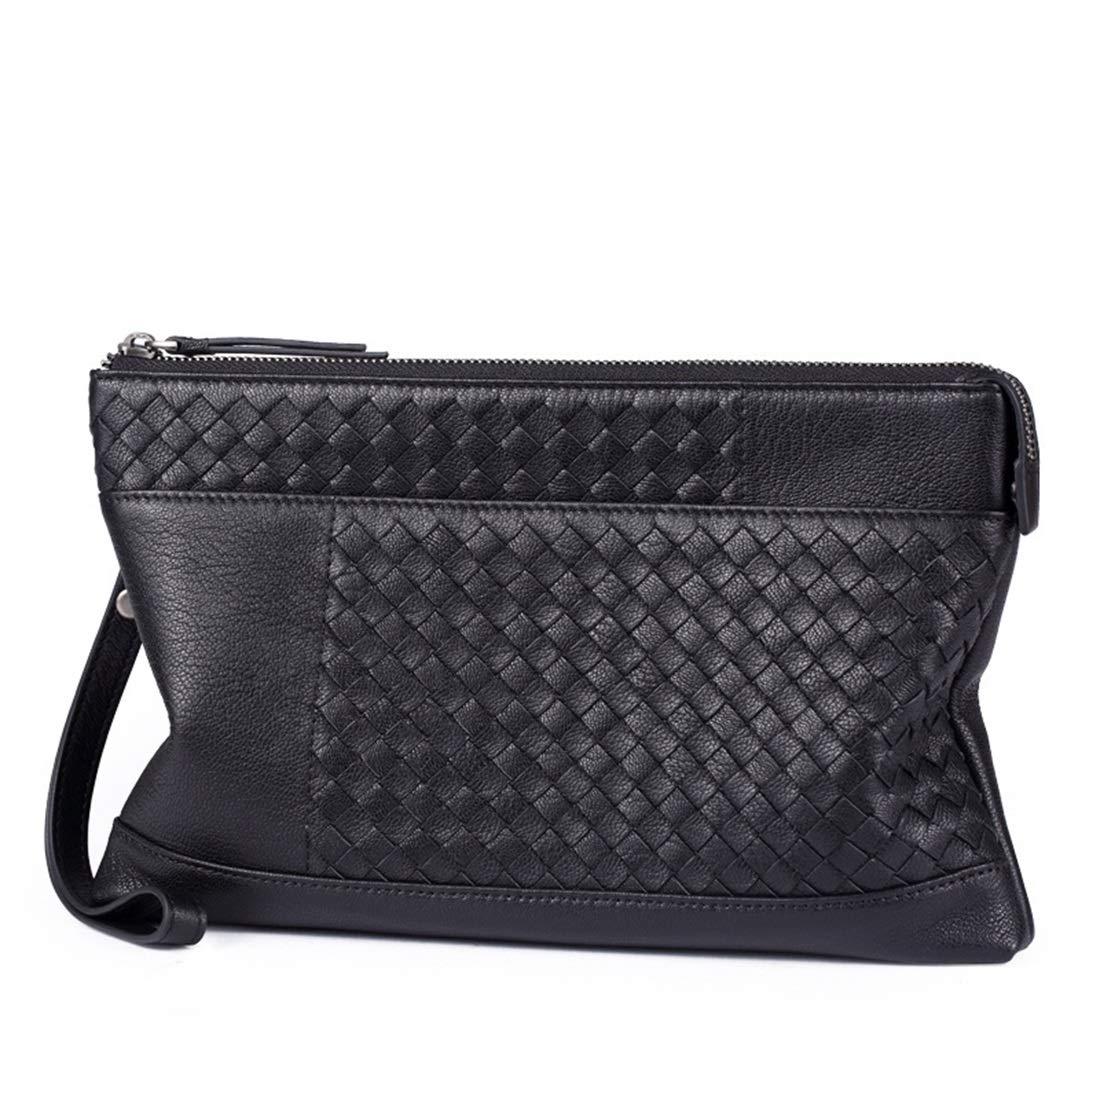 Gaisiteru メンズレザービジネスニットシープスキンクラッチ財布ハンドバッグ (色 : ブラック) B07QRR43X9 ブラック